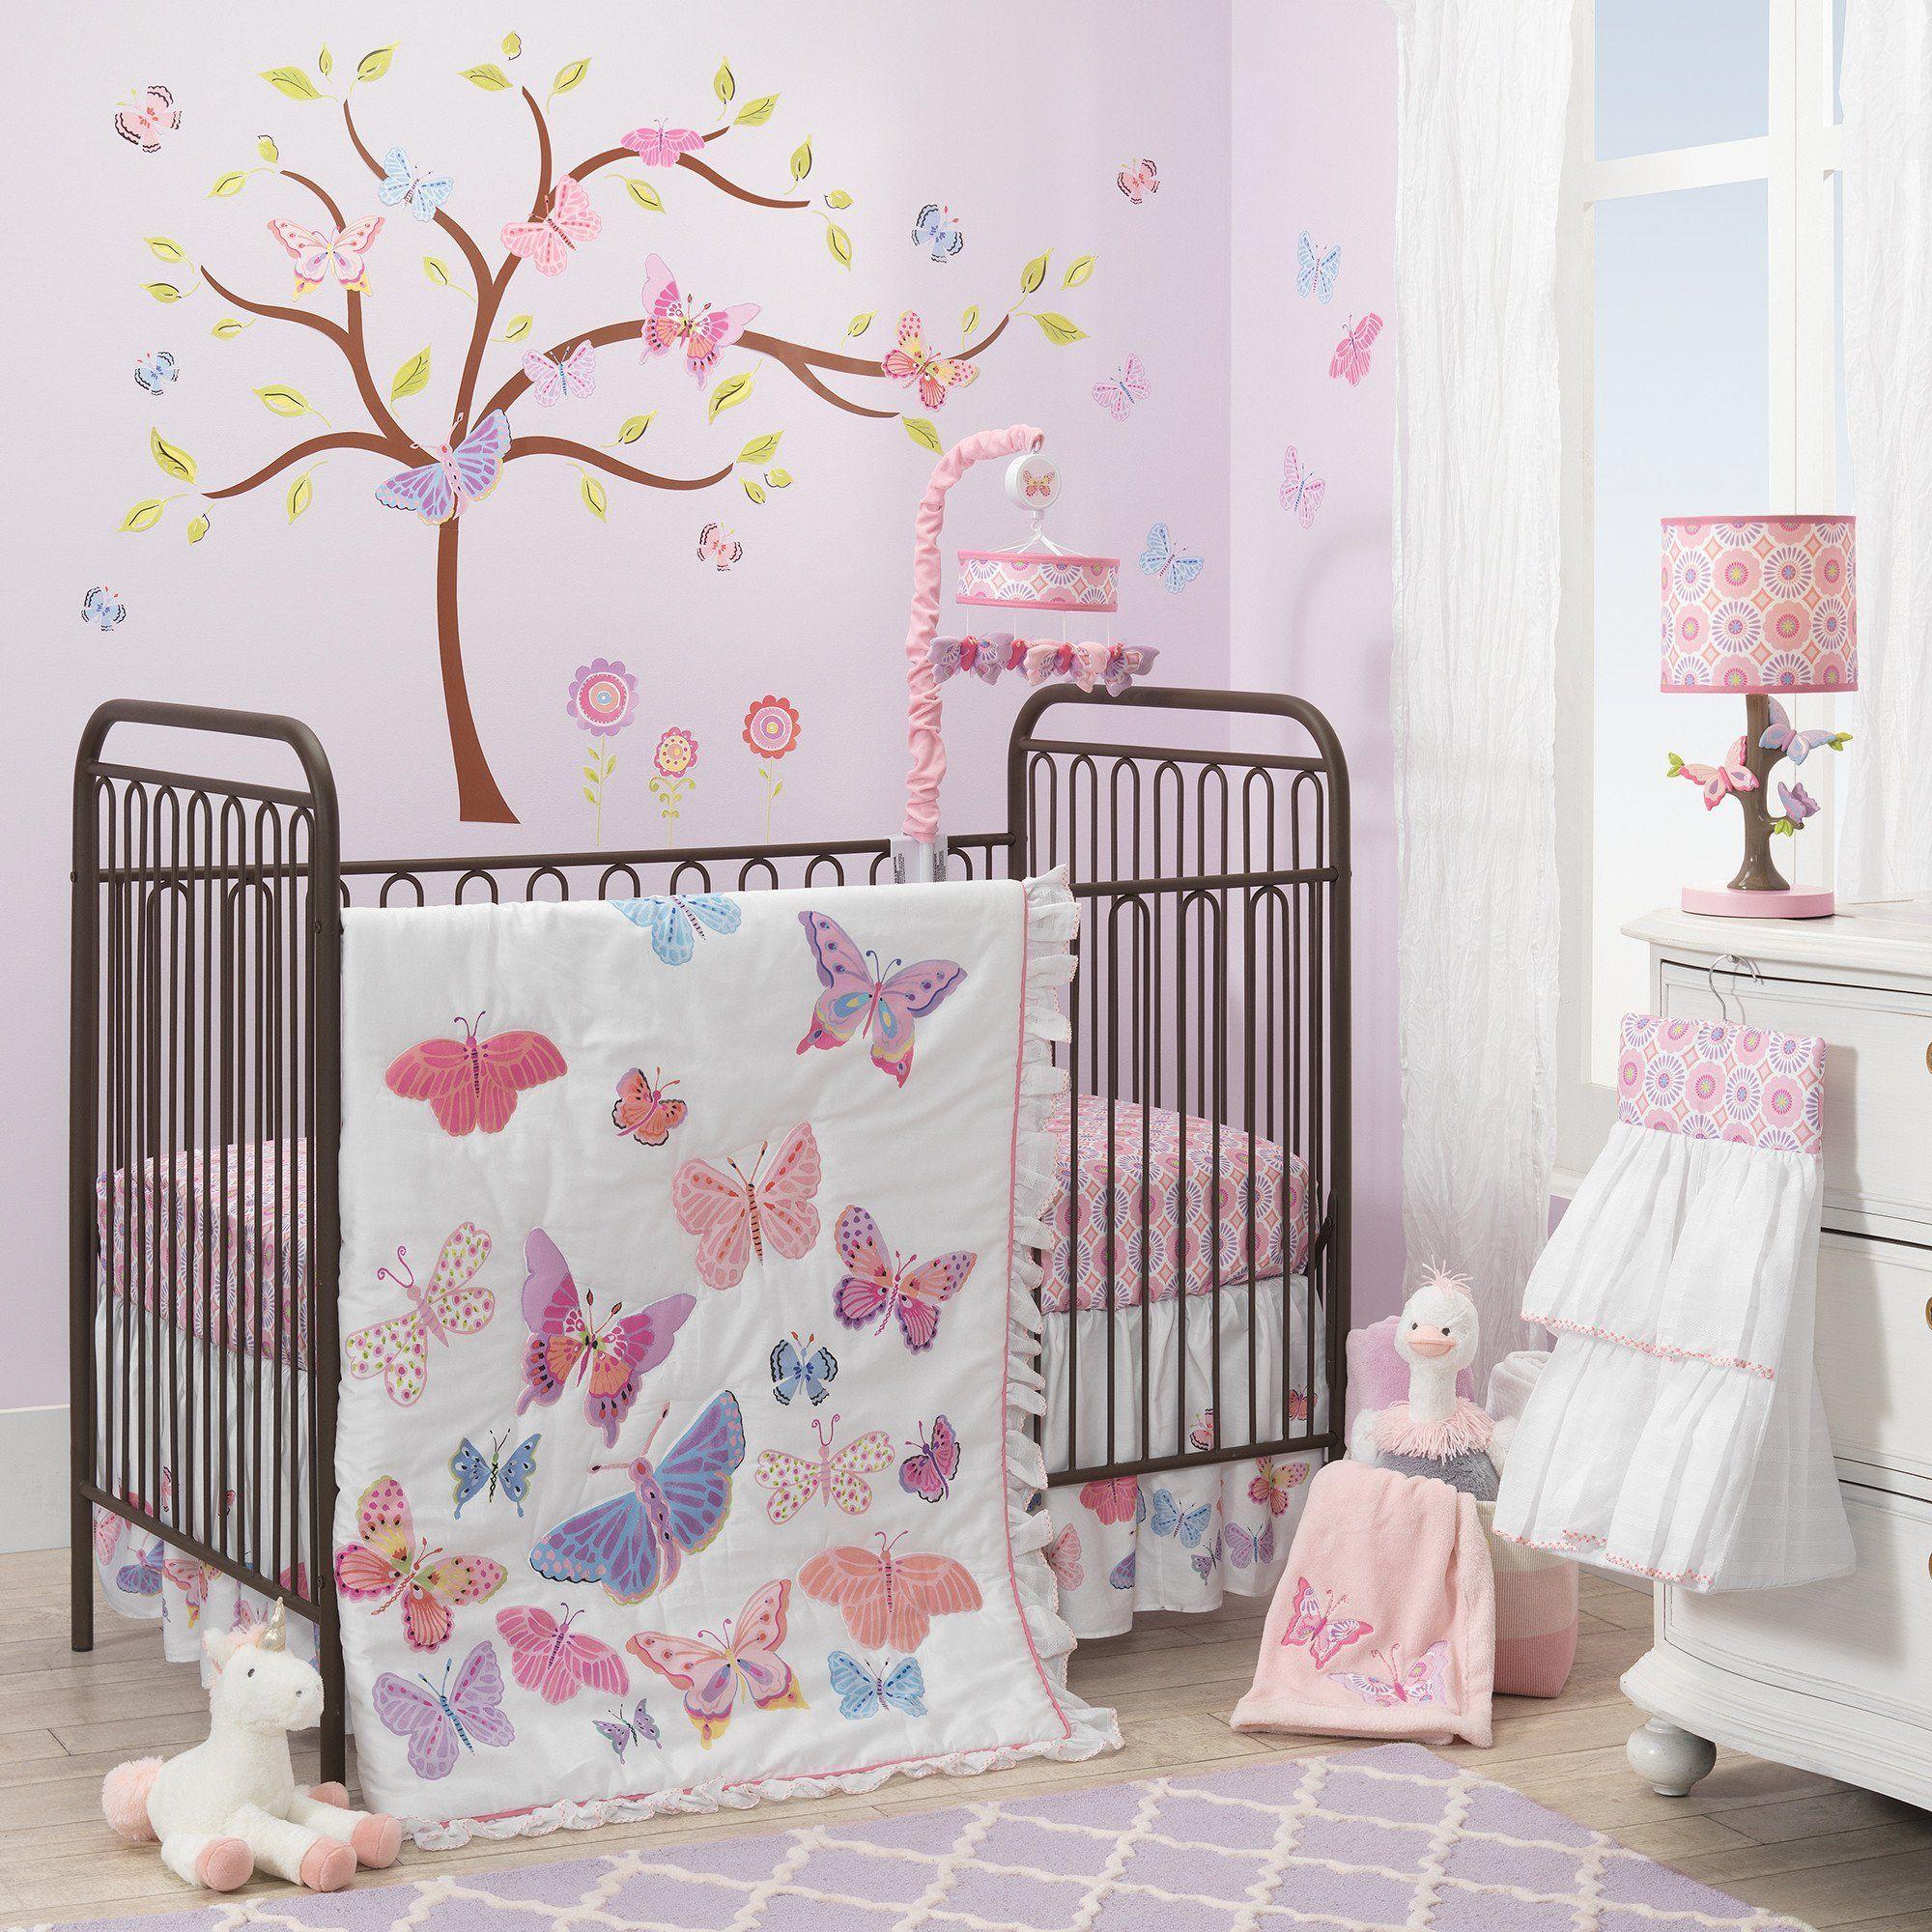 Butterfly Garden 8 Piece Nursery To Go Crib Bedding Set